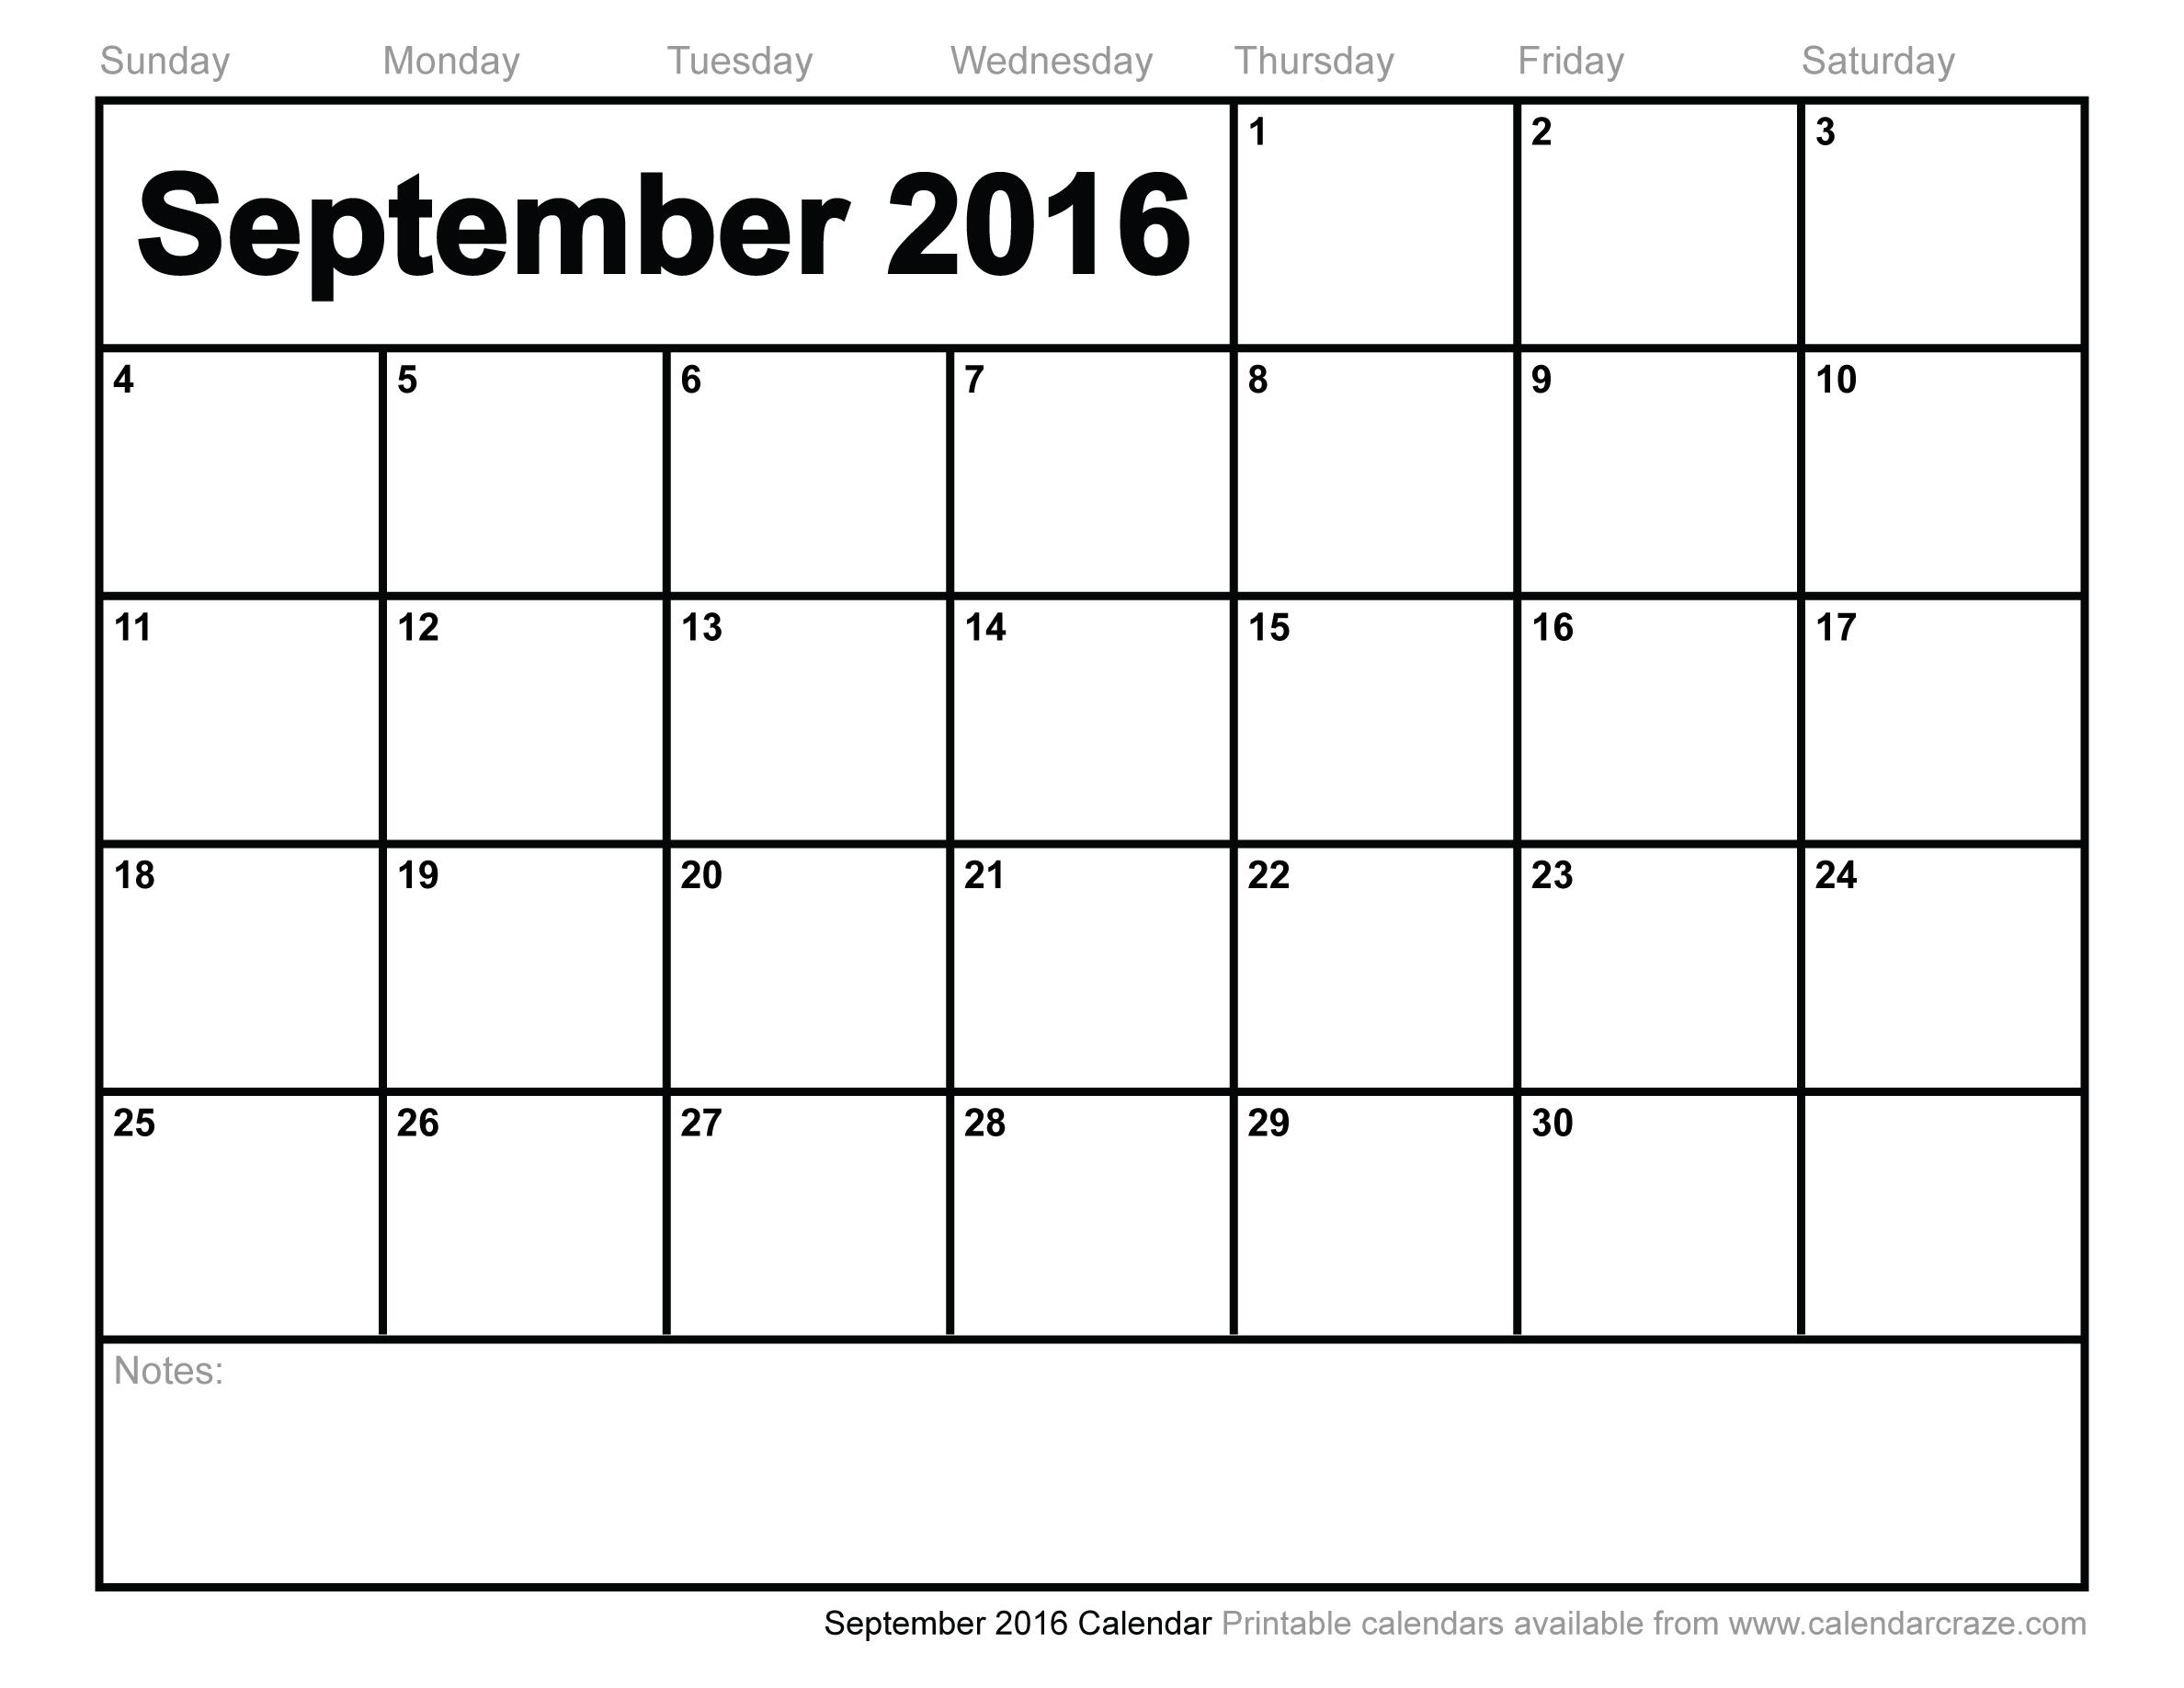 Images of Sept 2016 Calendar Printable Free - December 2014 Calendar ...